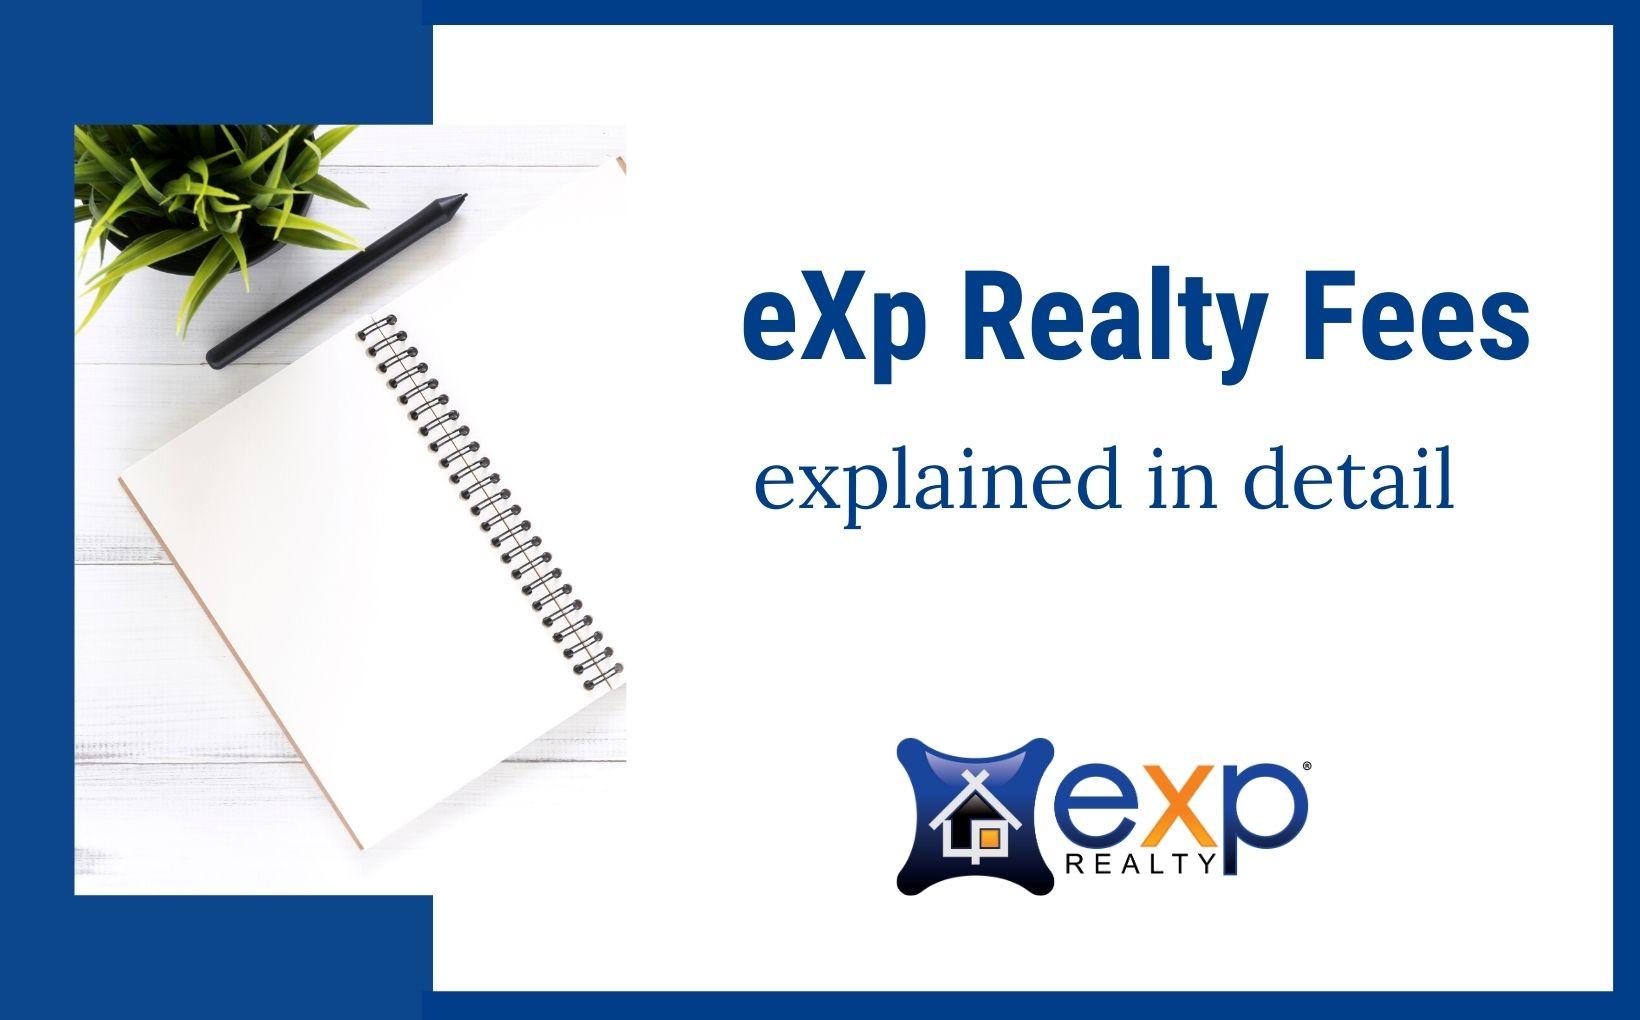 eXp Realy fees explained blog post, Jesse Dau